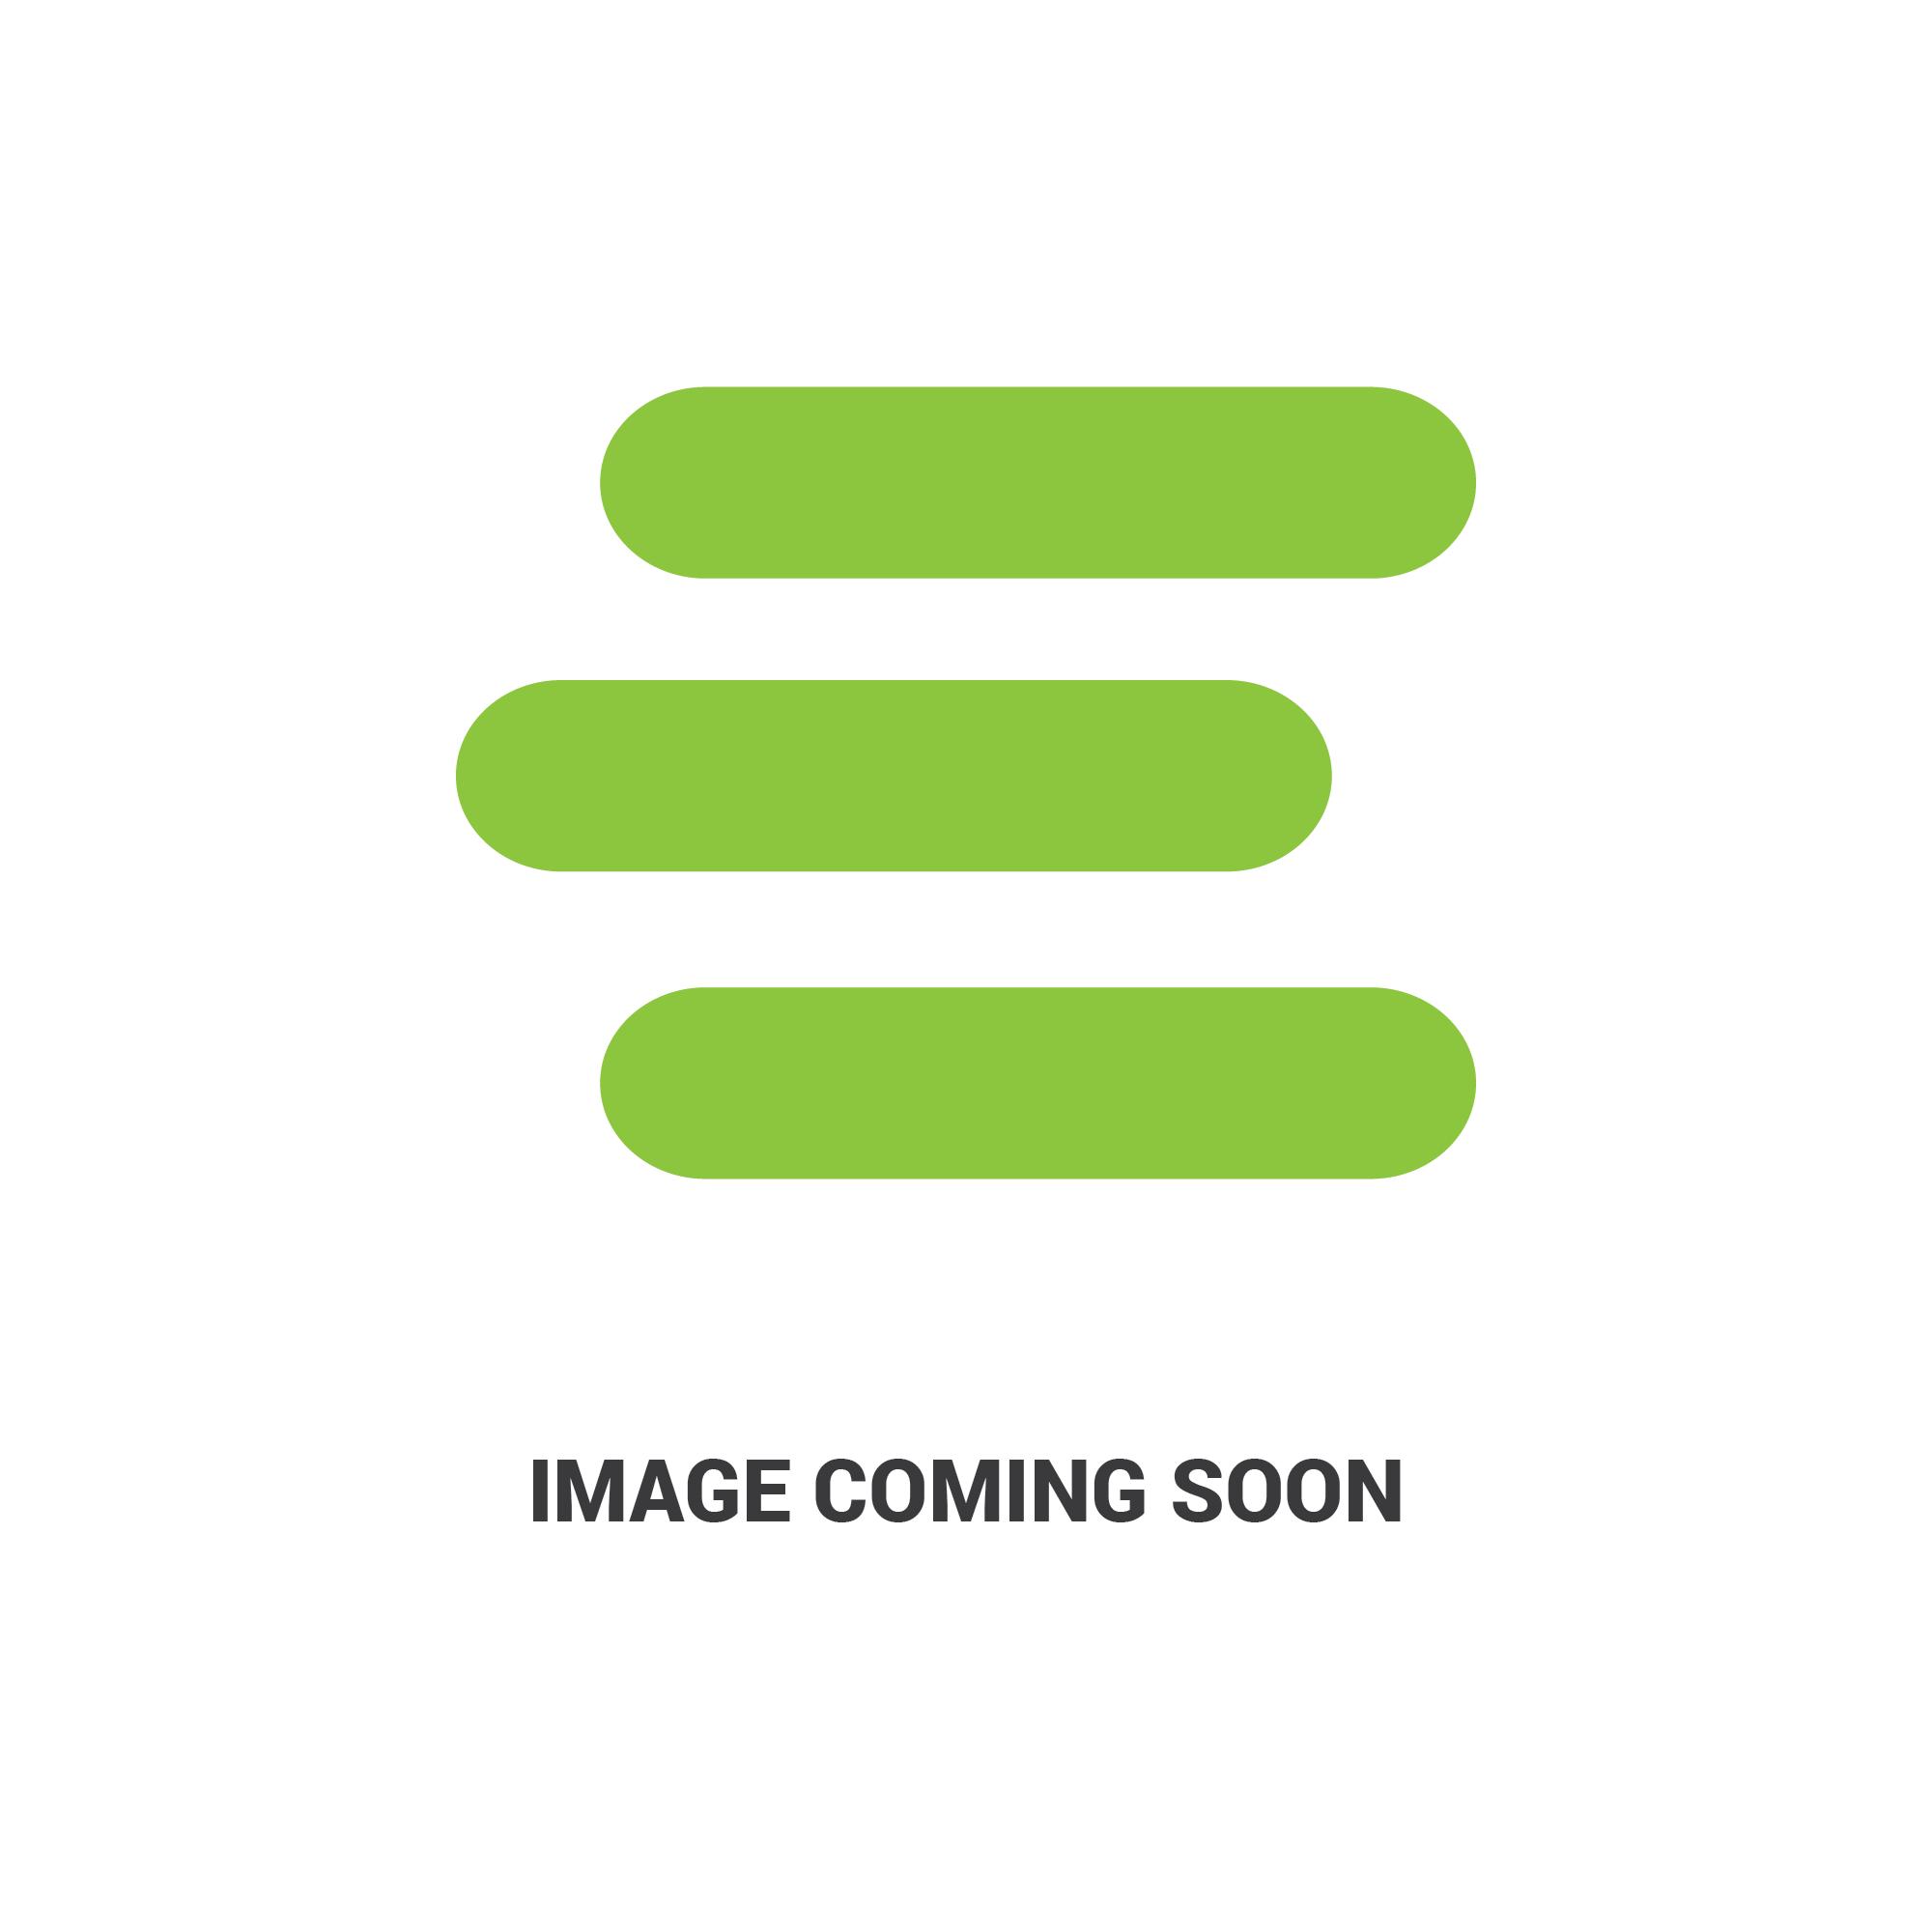 E-16030-51052edit 3.jpg